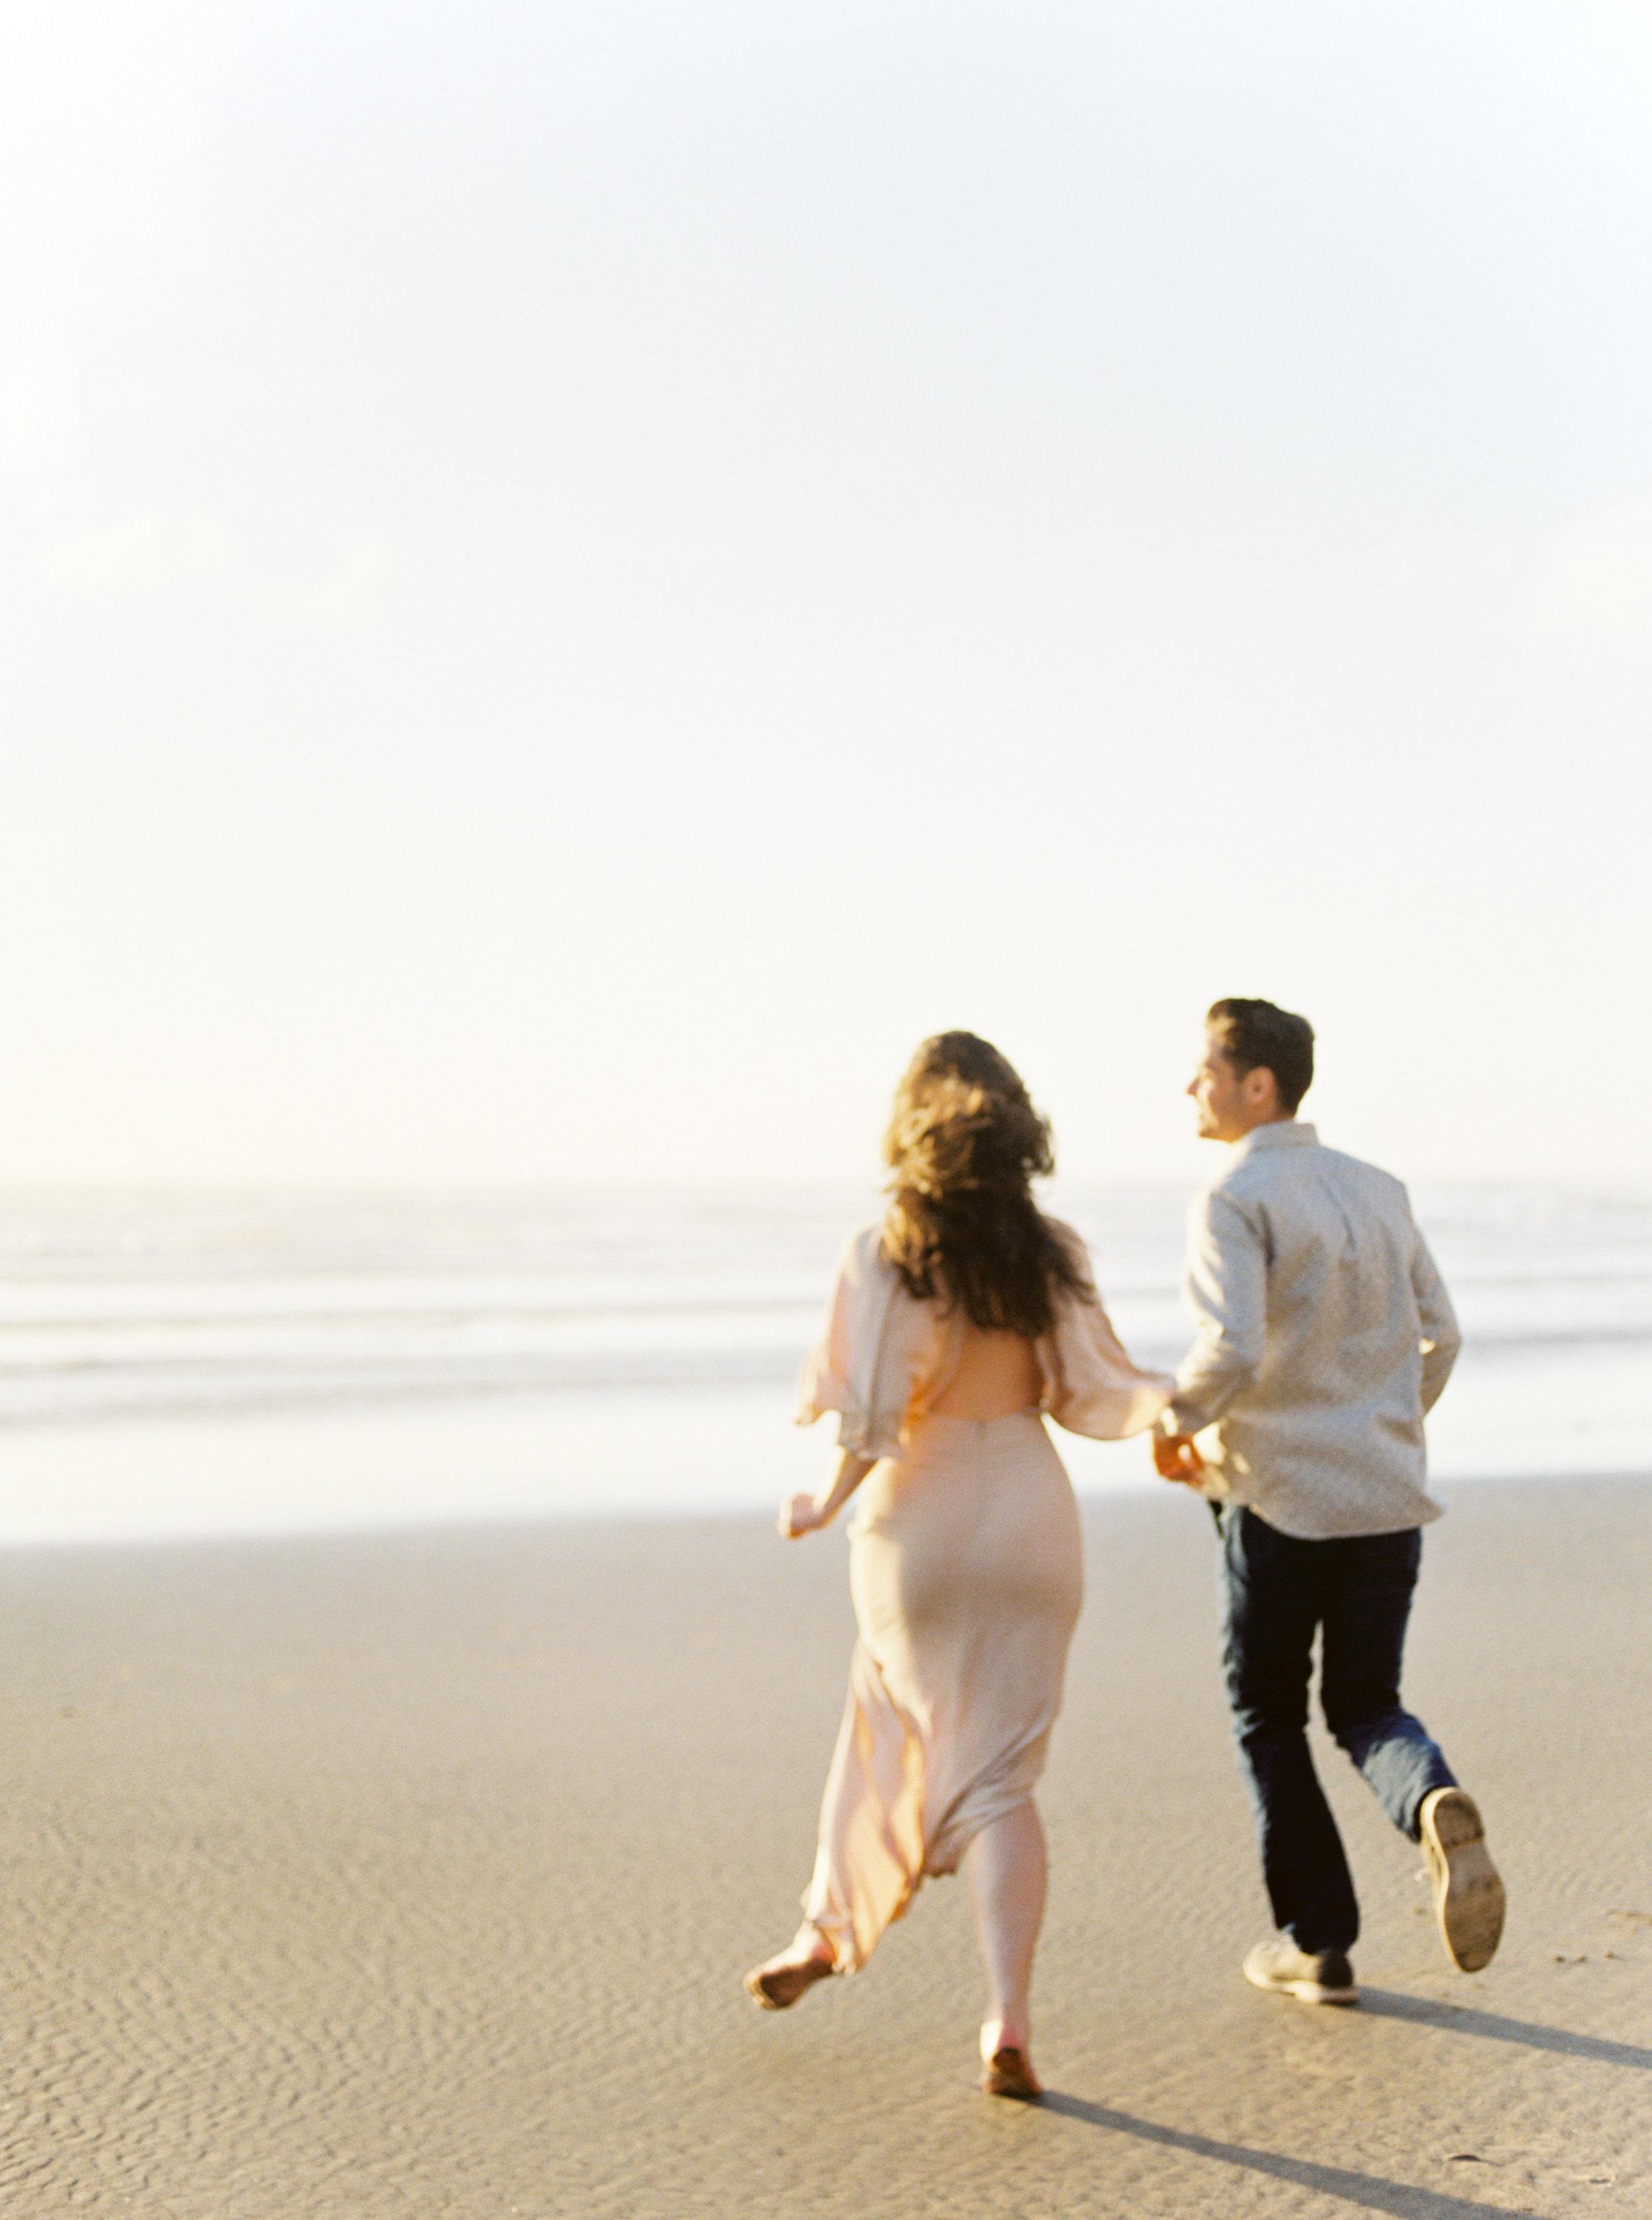 Engagement Photos at Oregon Coast while running on beach